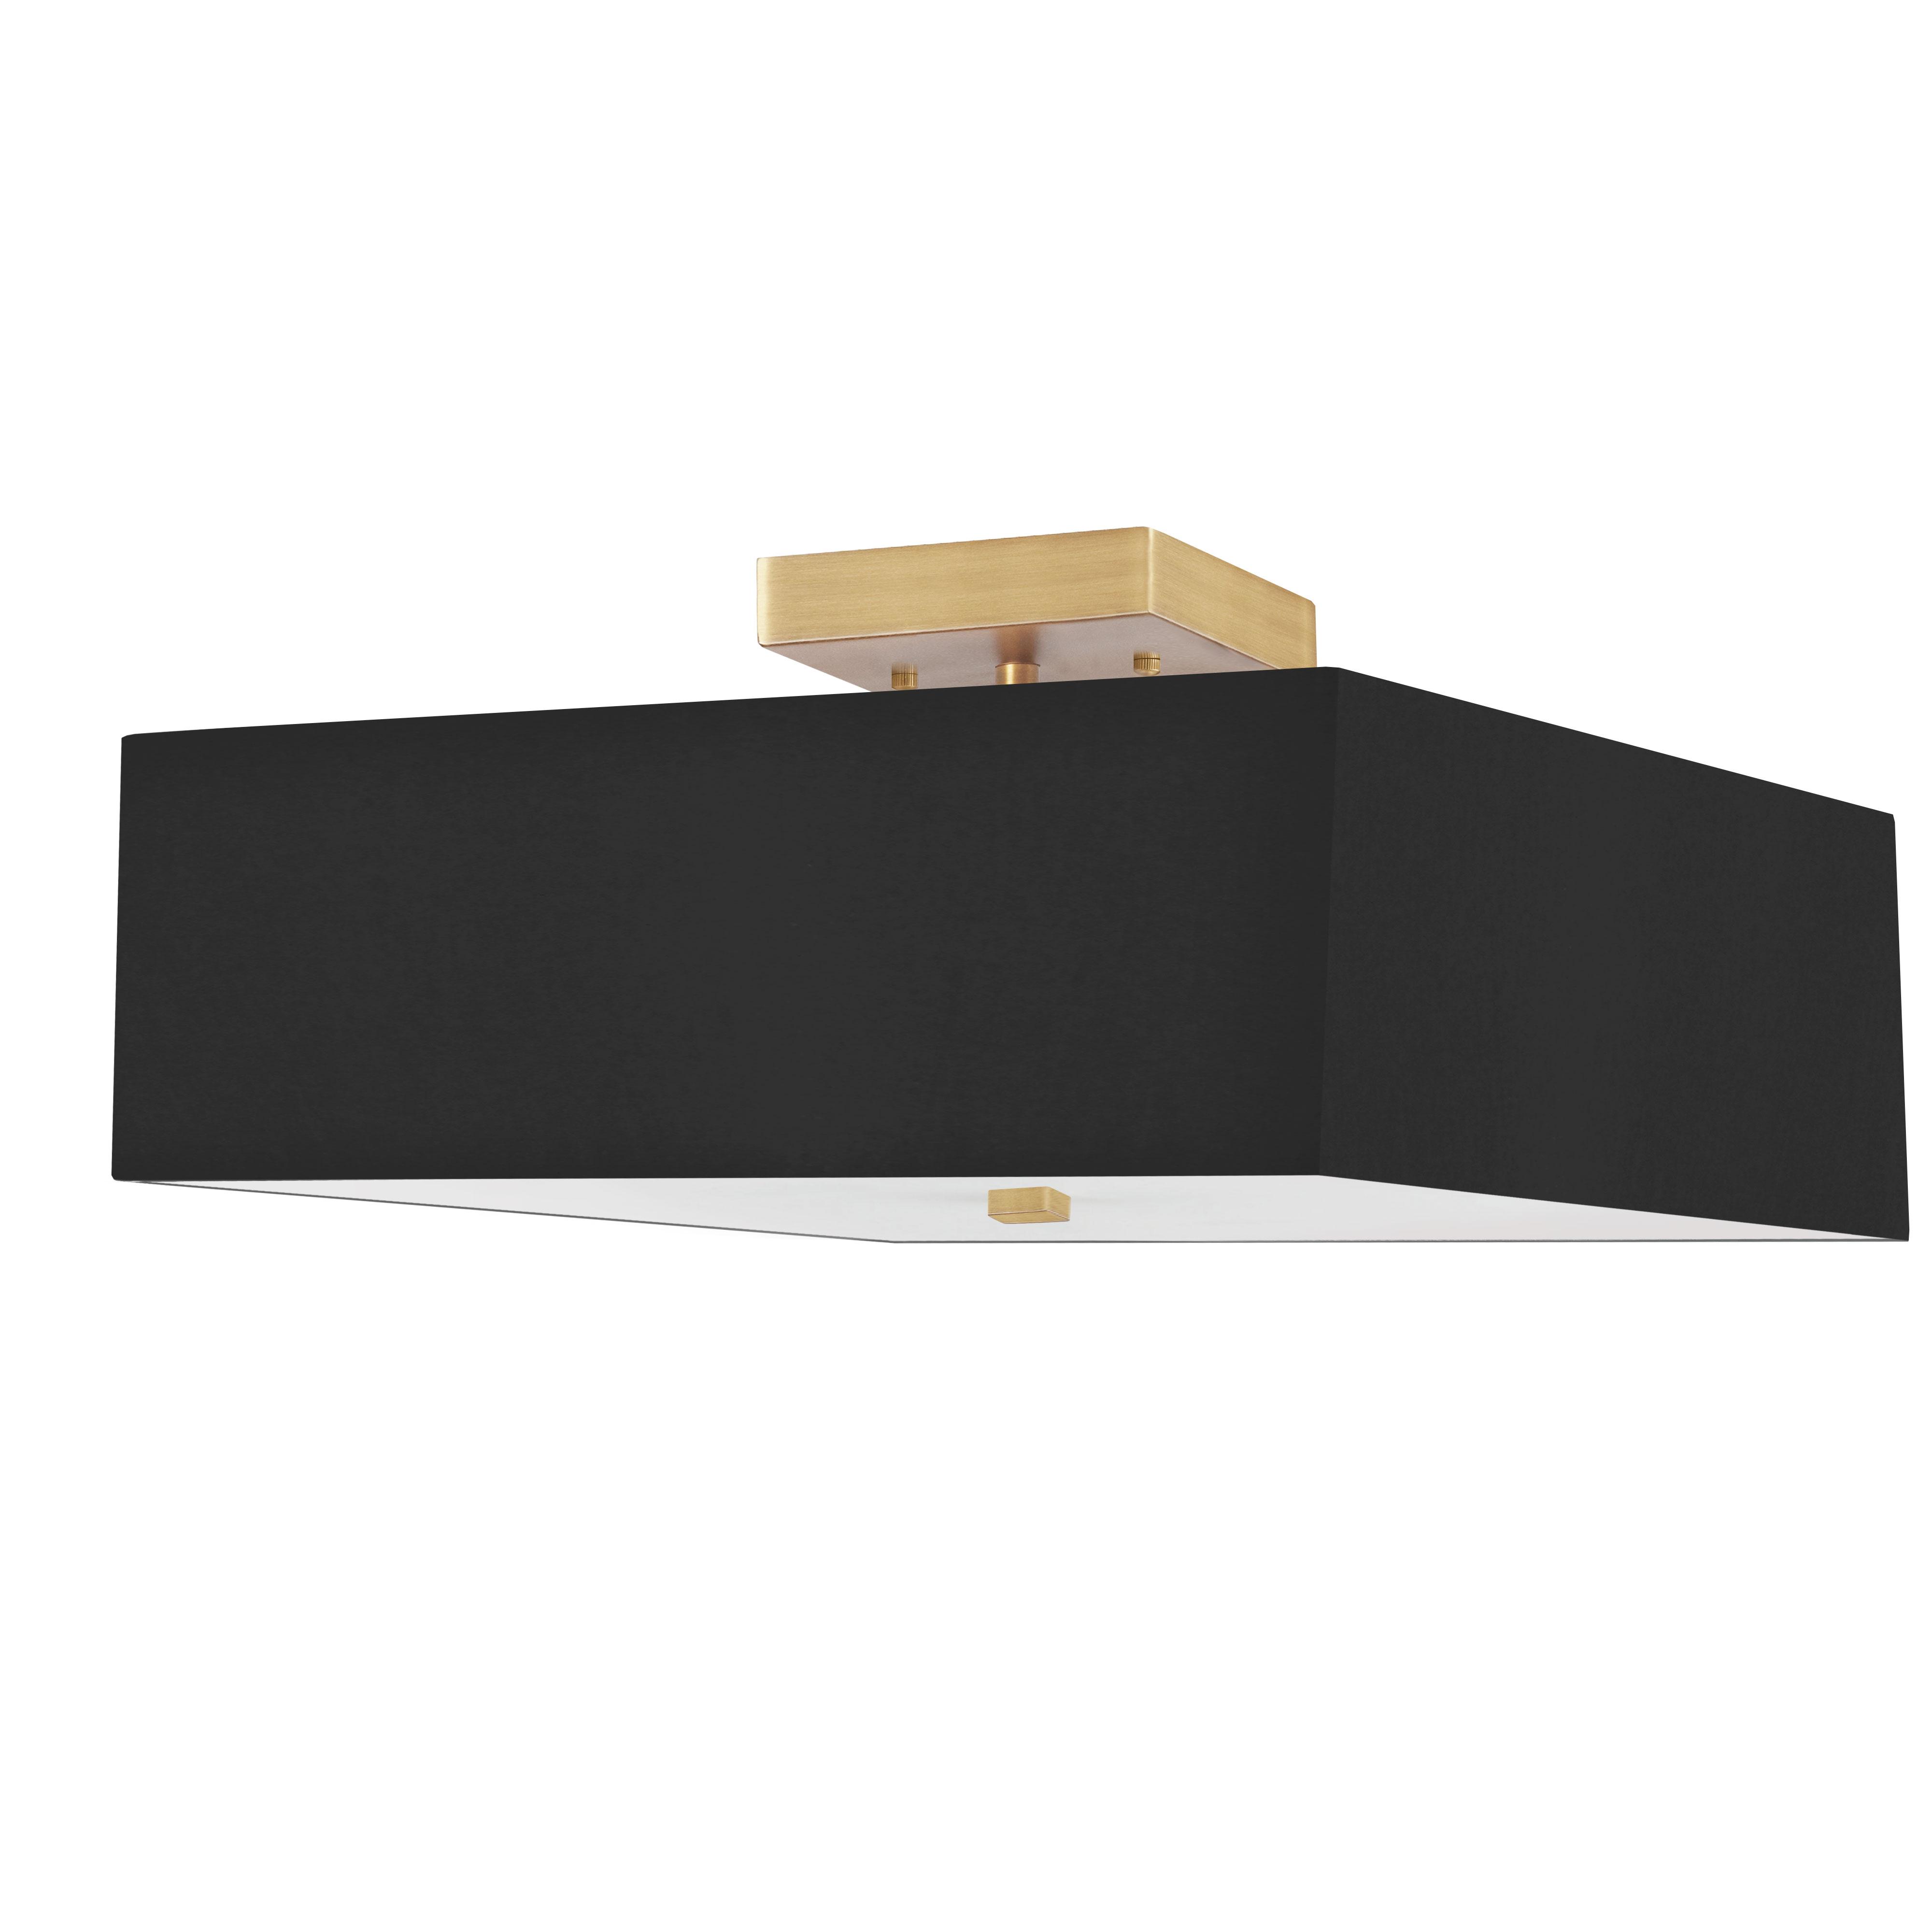 3LT Incandescent Semi-Flush AGB w/ Black Shade